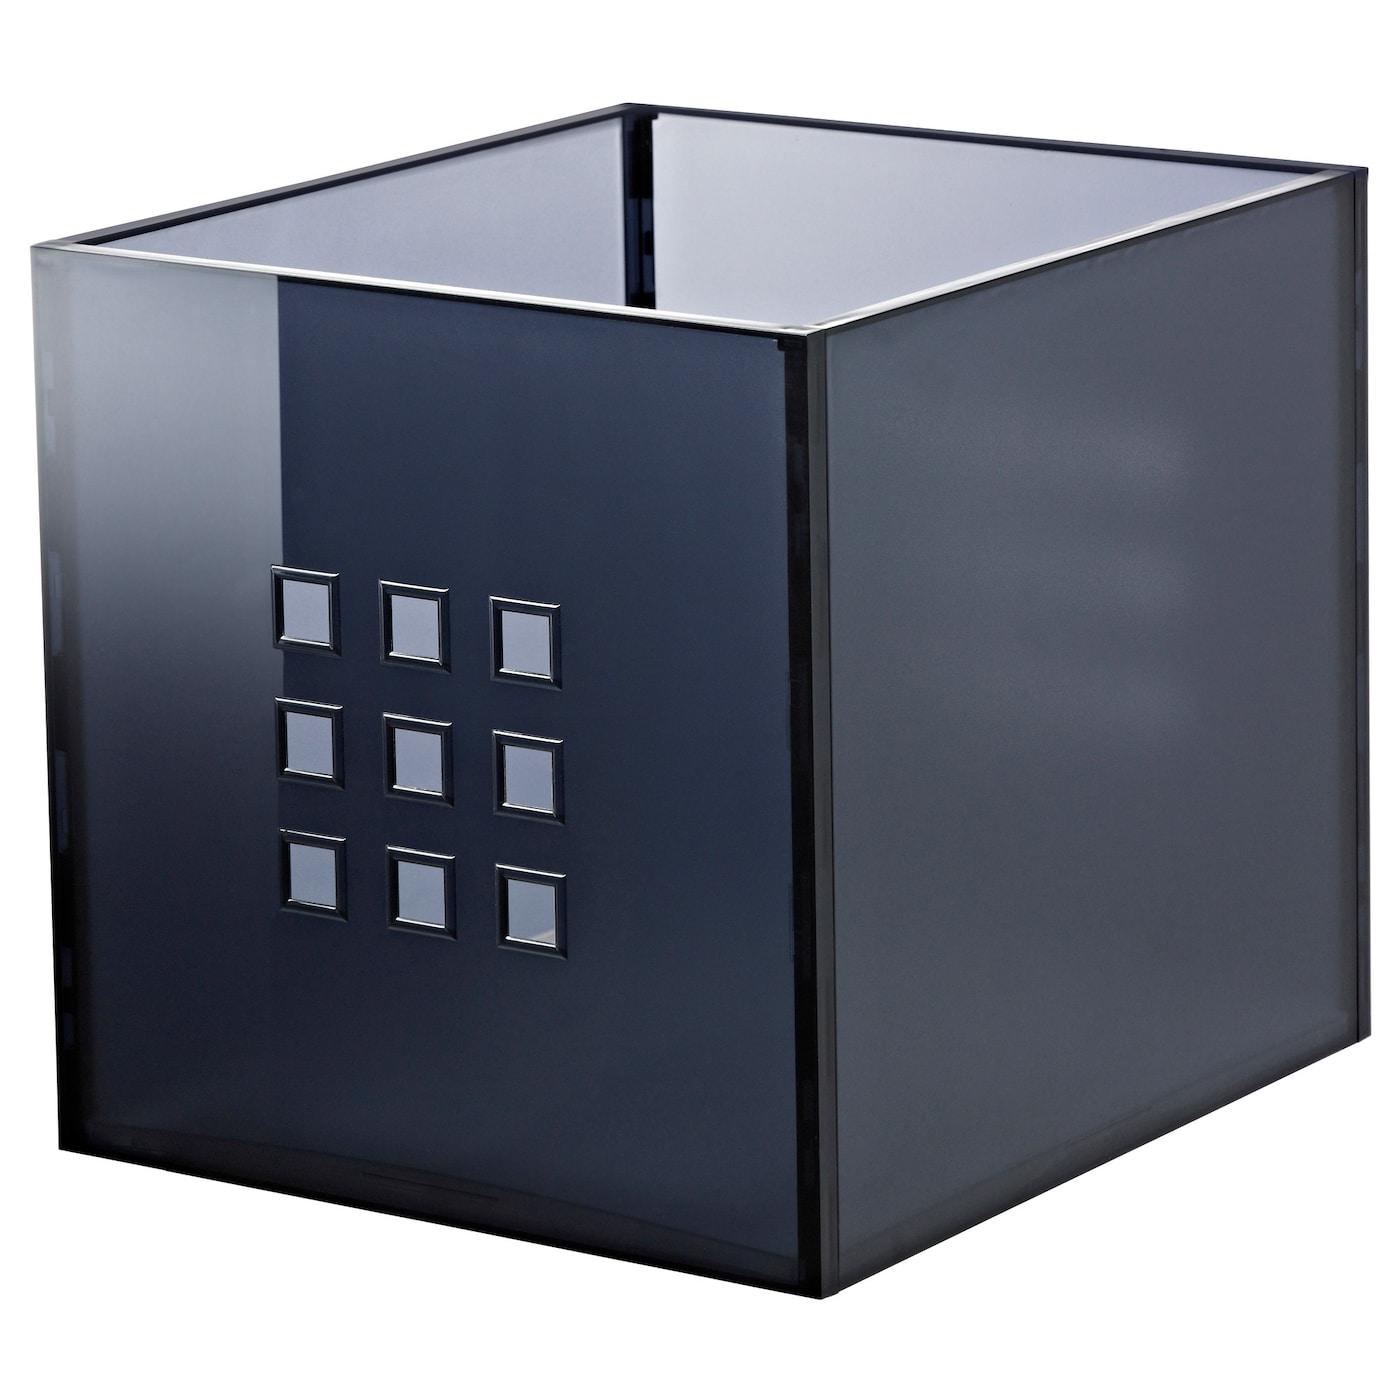 lekman bo te gris fonc 33 x 37 x 33 cm ikea. Black Bedroom Furniture Sets. Home Design Ideas